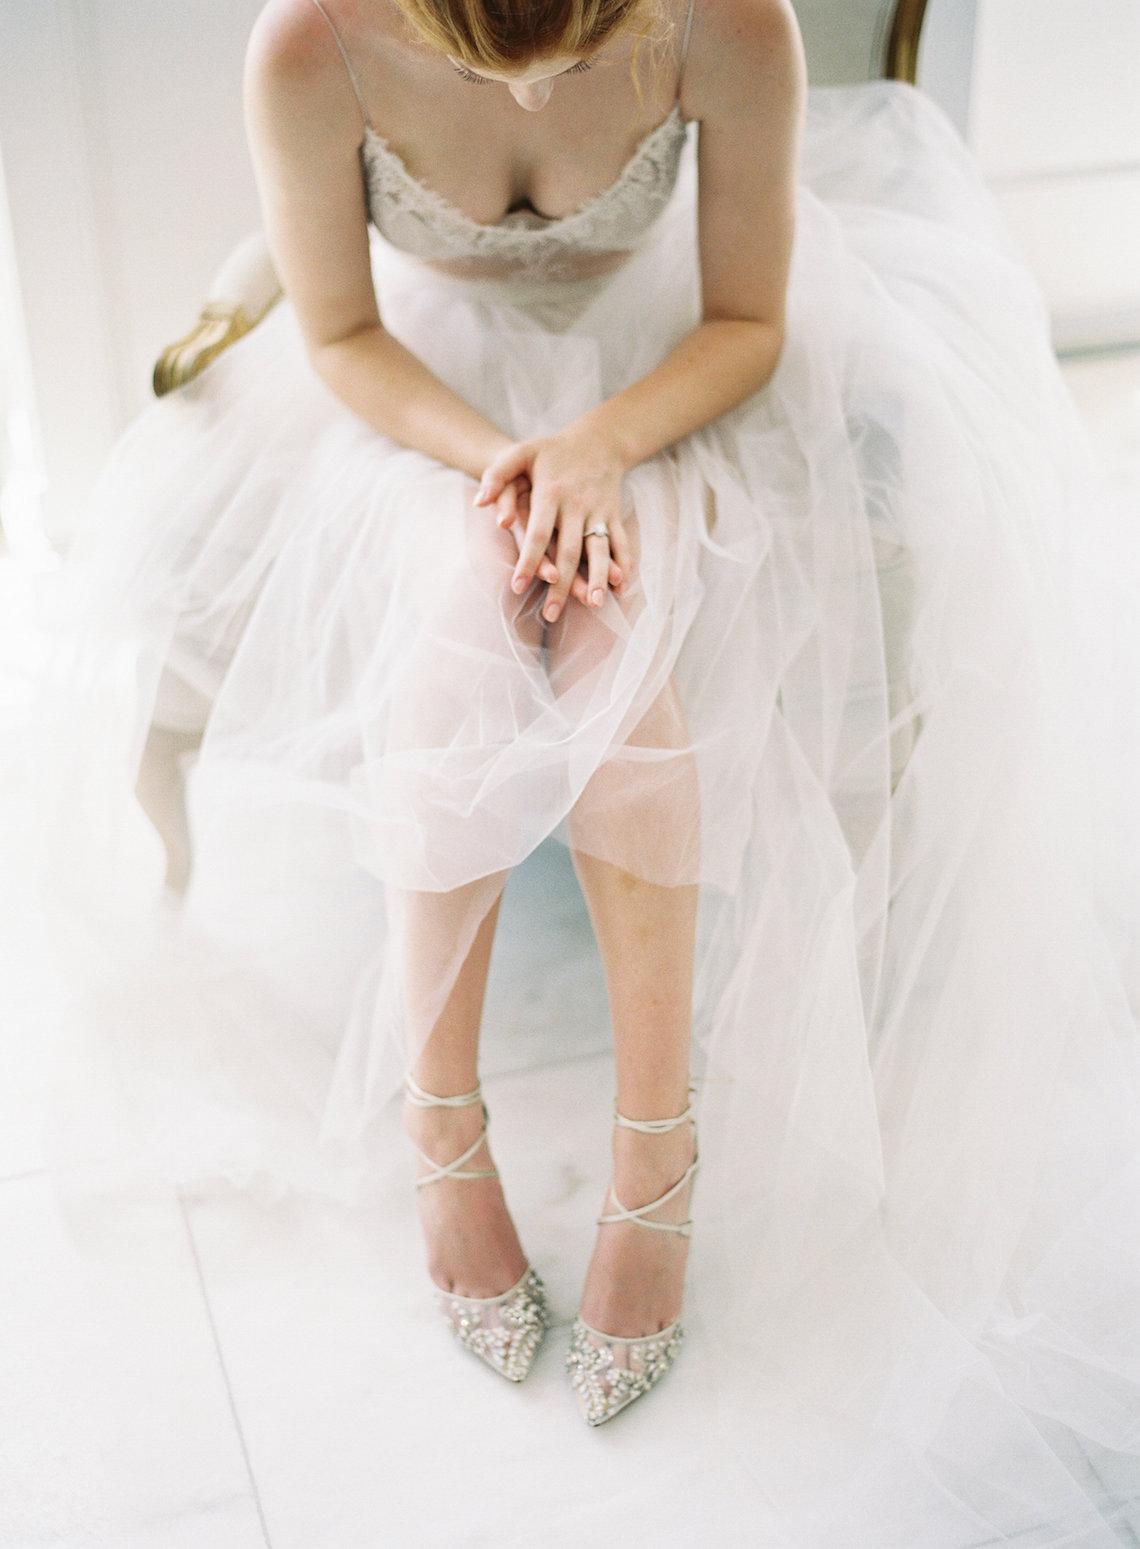 Bella Belle Shoes Lookbook by Kurt Boomer Photography 57